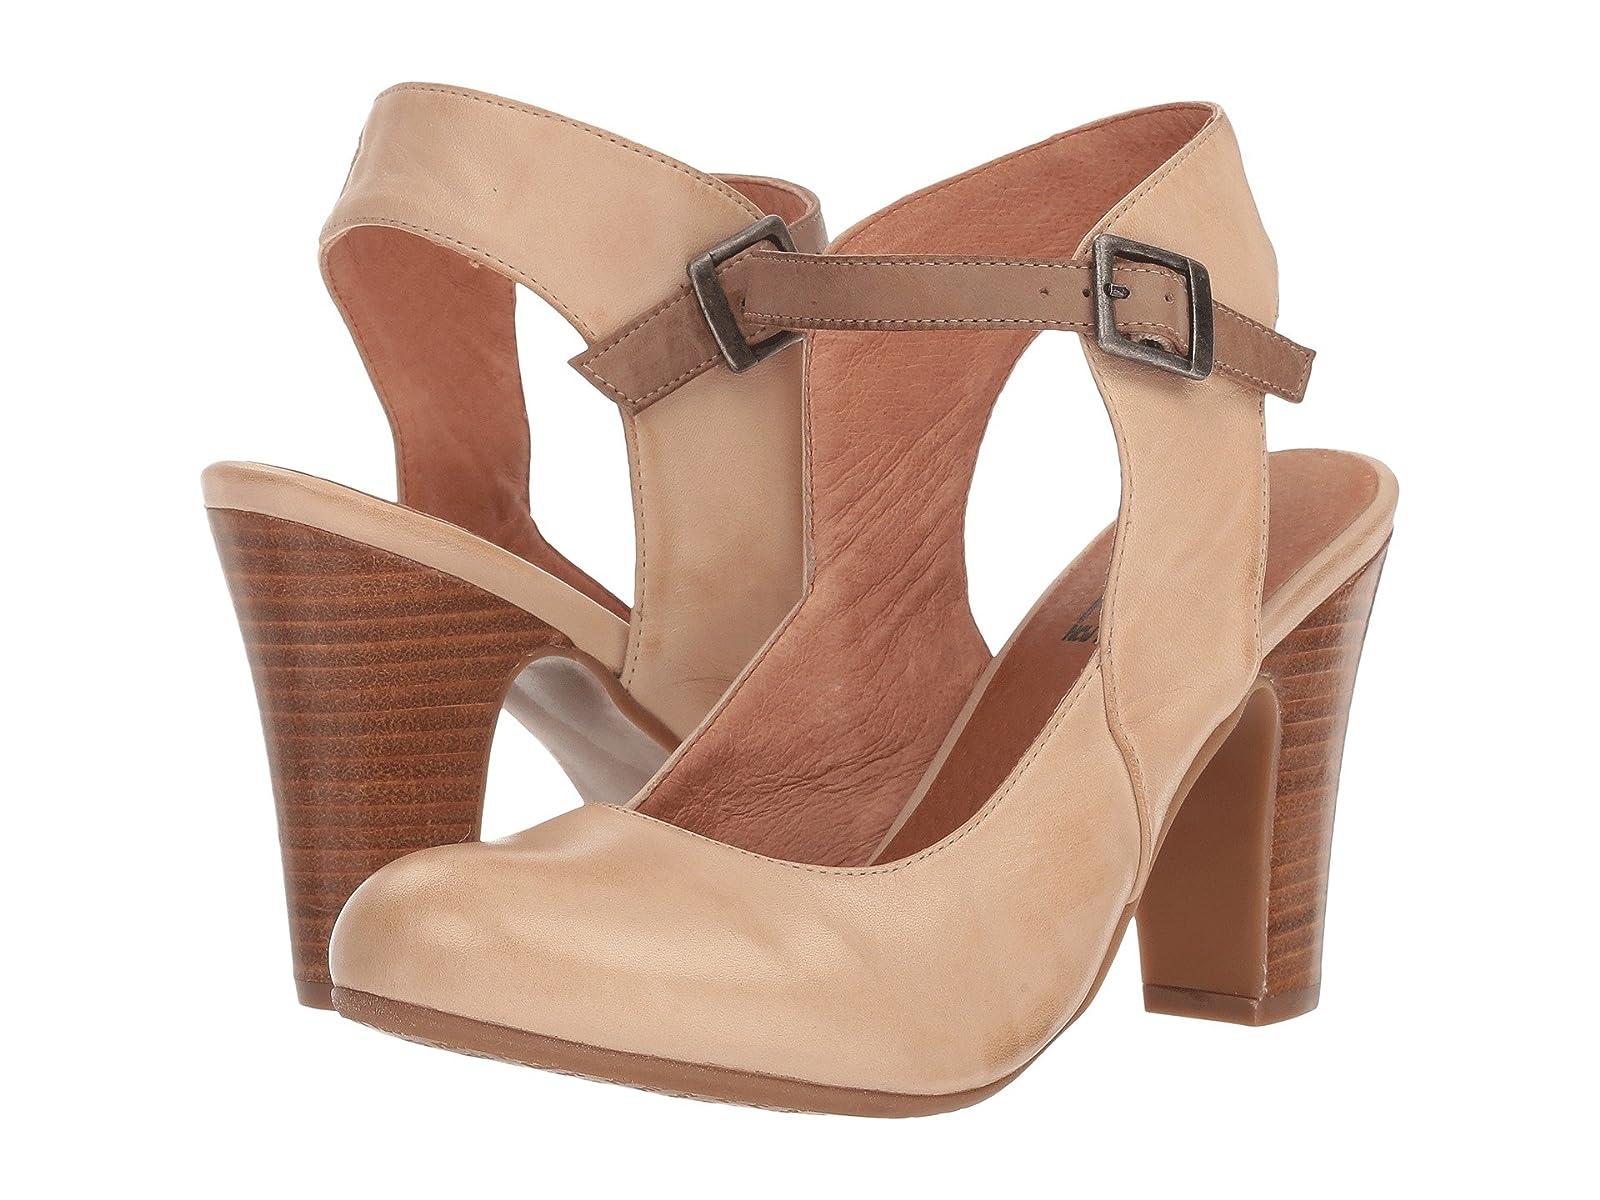 Miz Mooz JannaCheap and distinctive eye-catching shoes